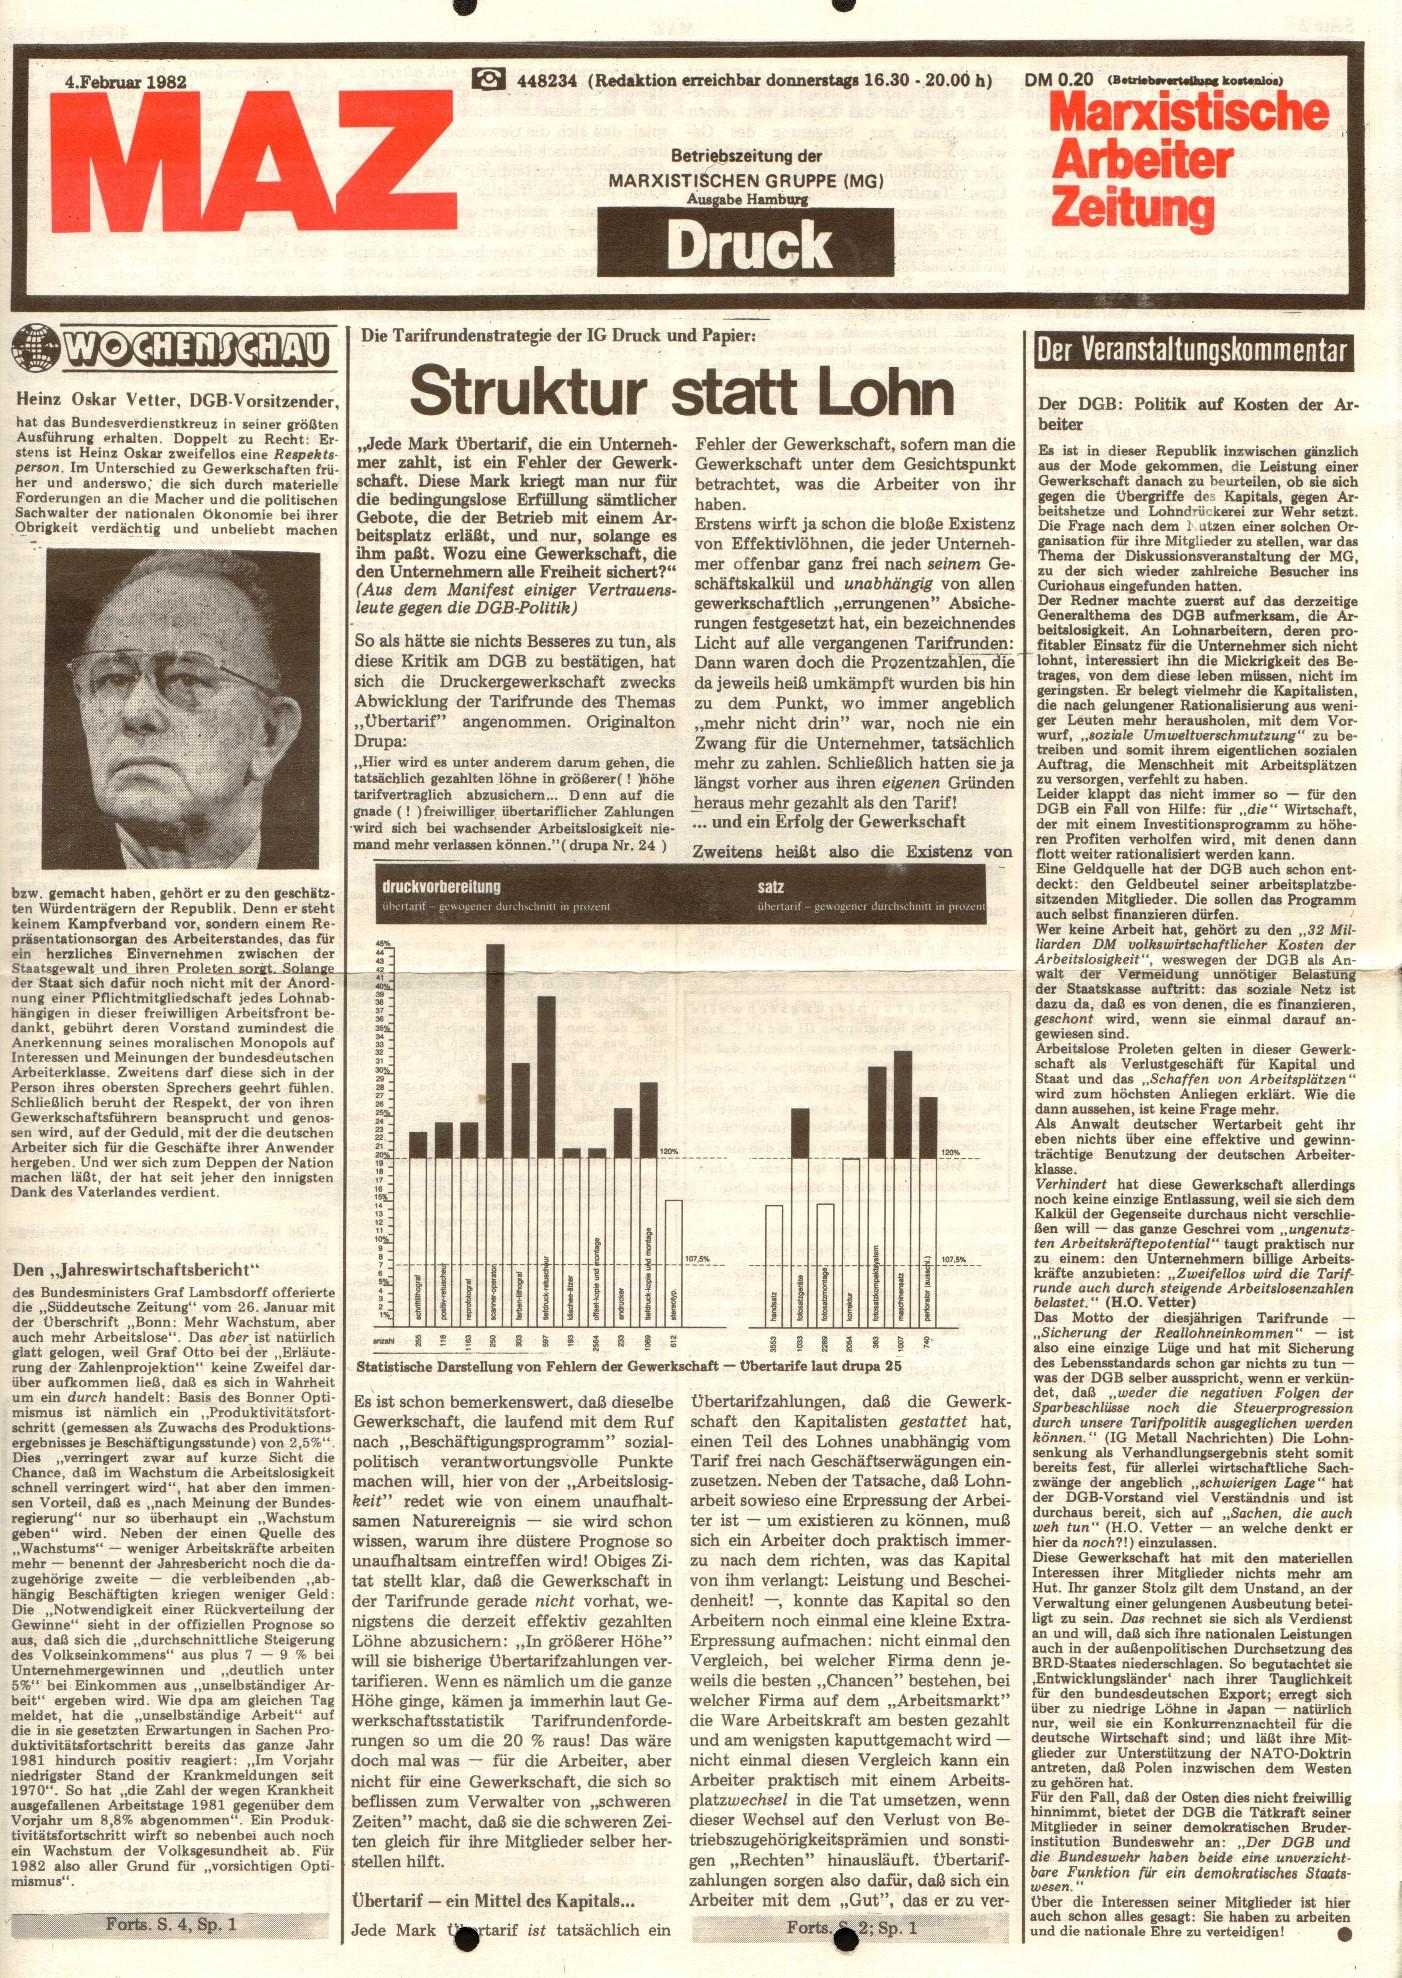 Hamburg_MG_MAZ_Druck_19820204_01